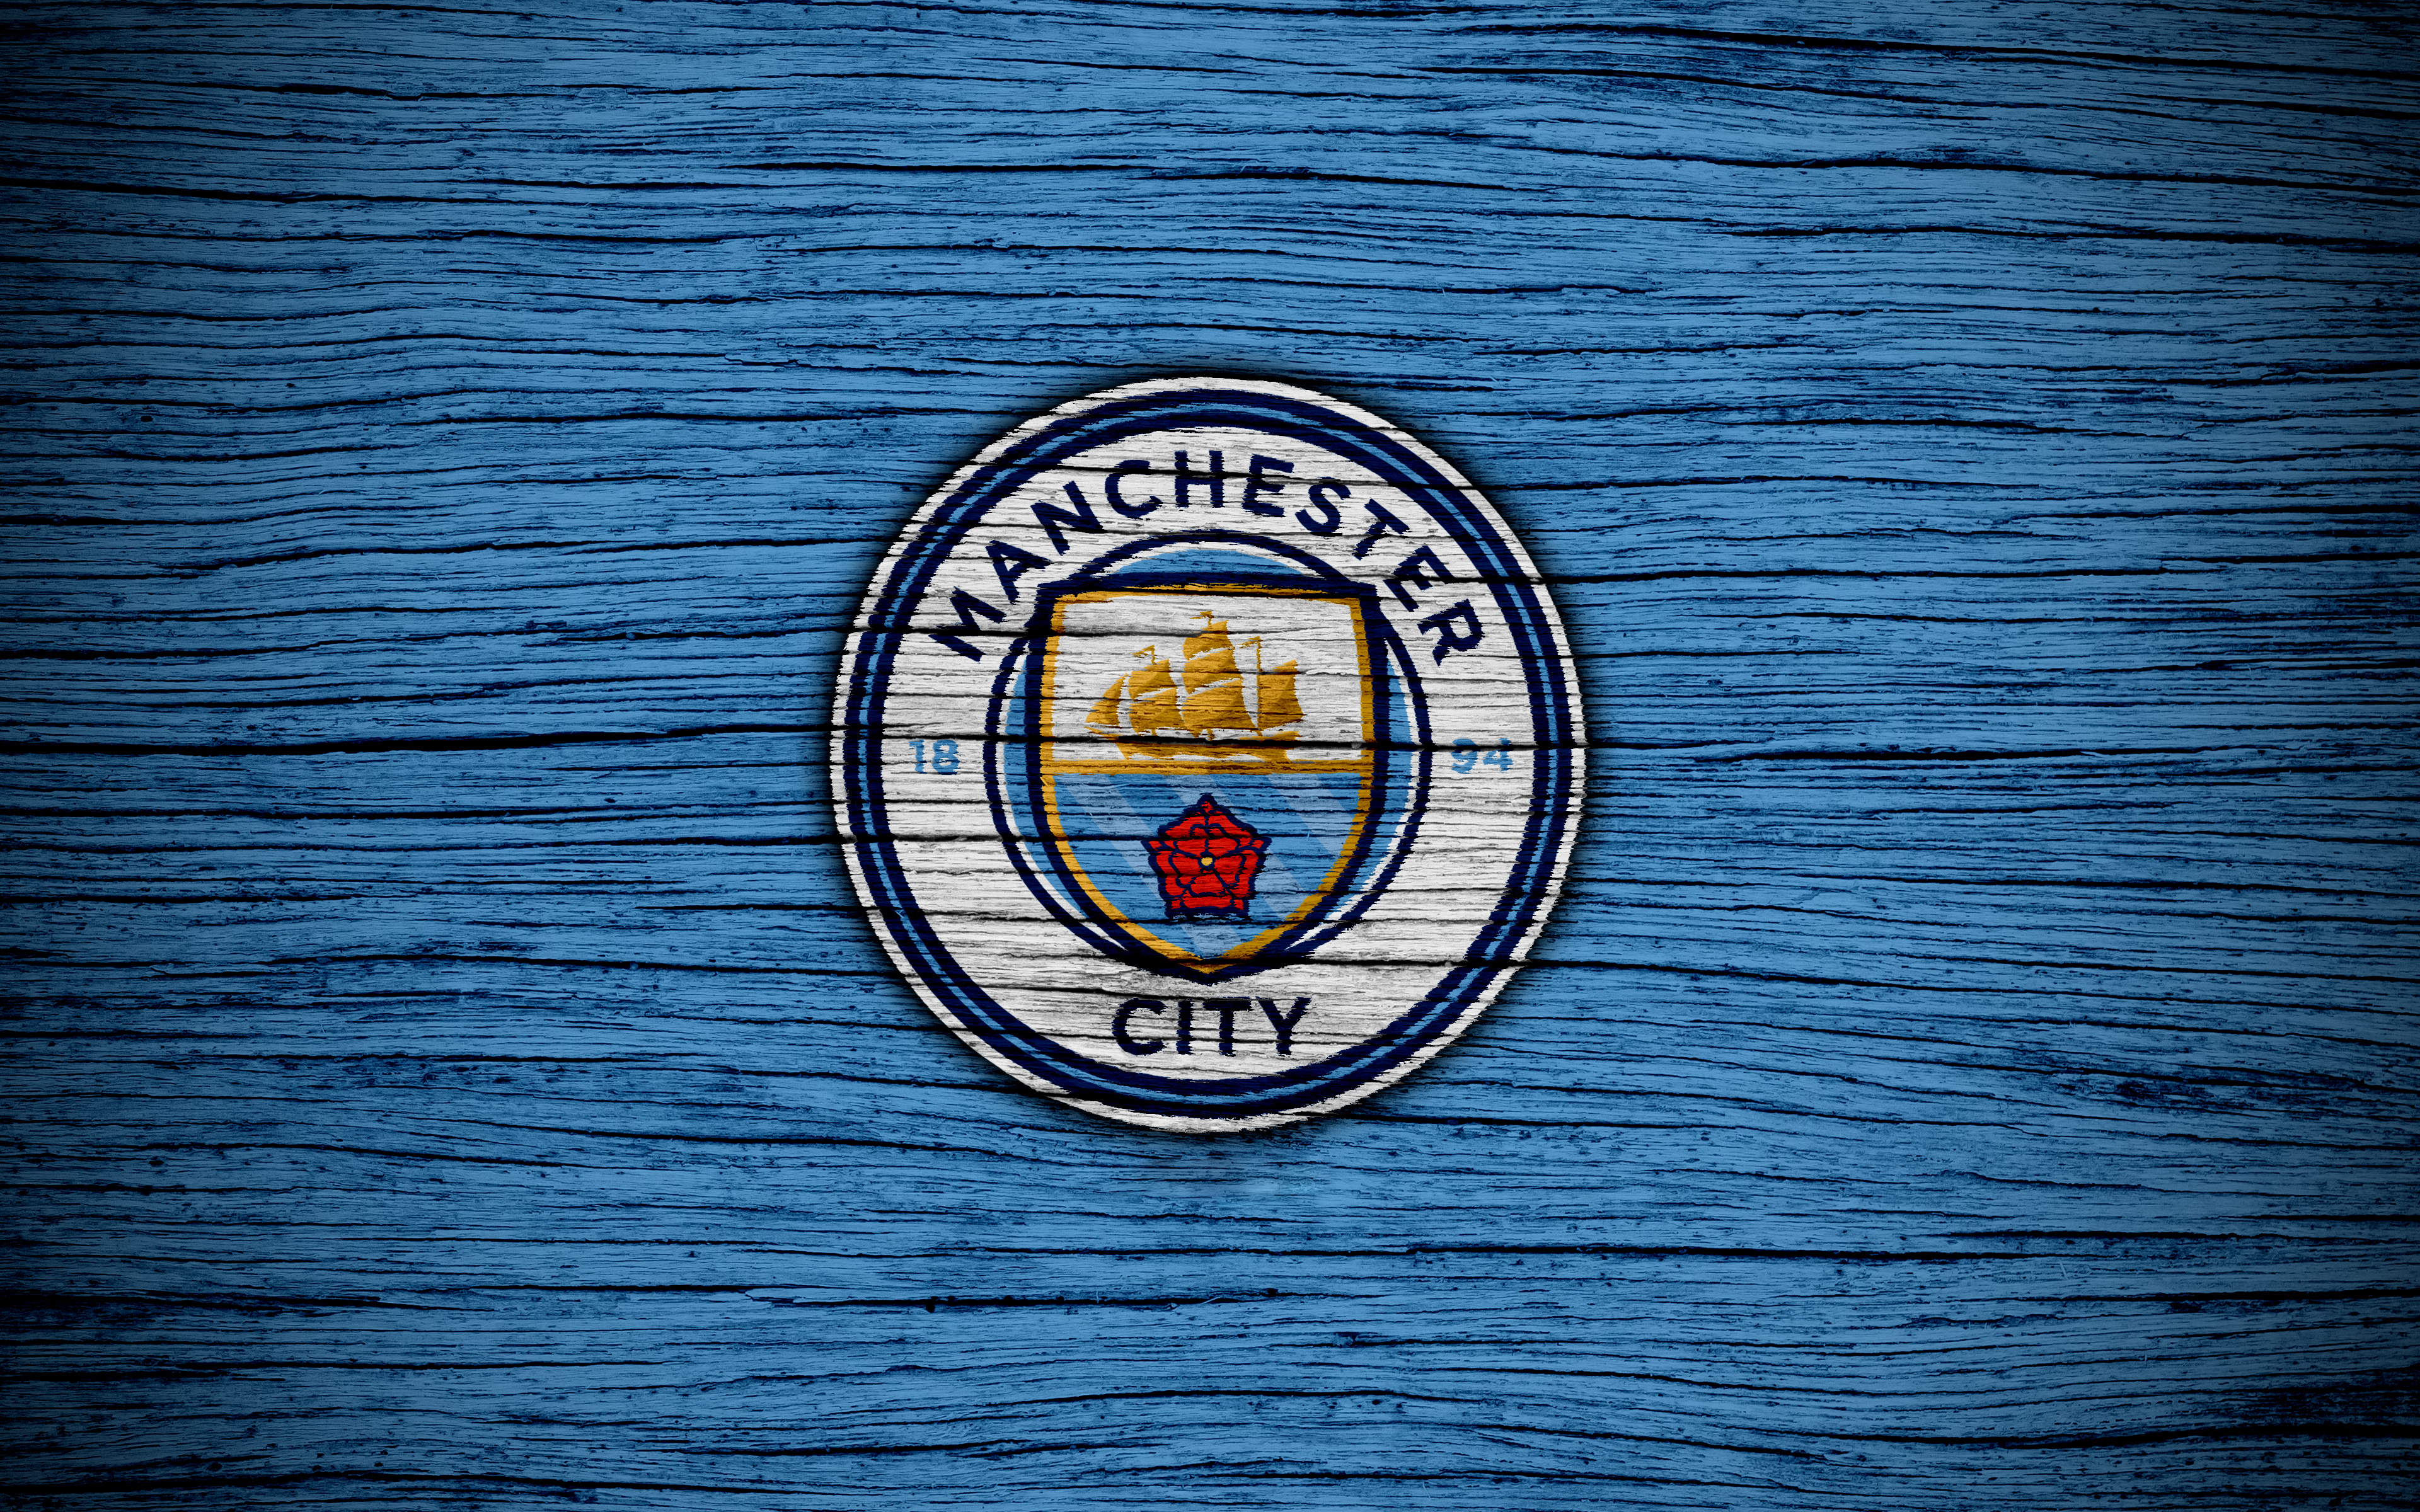 Manchester City Logo 4k Ultra HD Wallpaper | Background ...